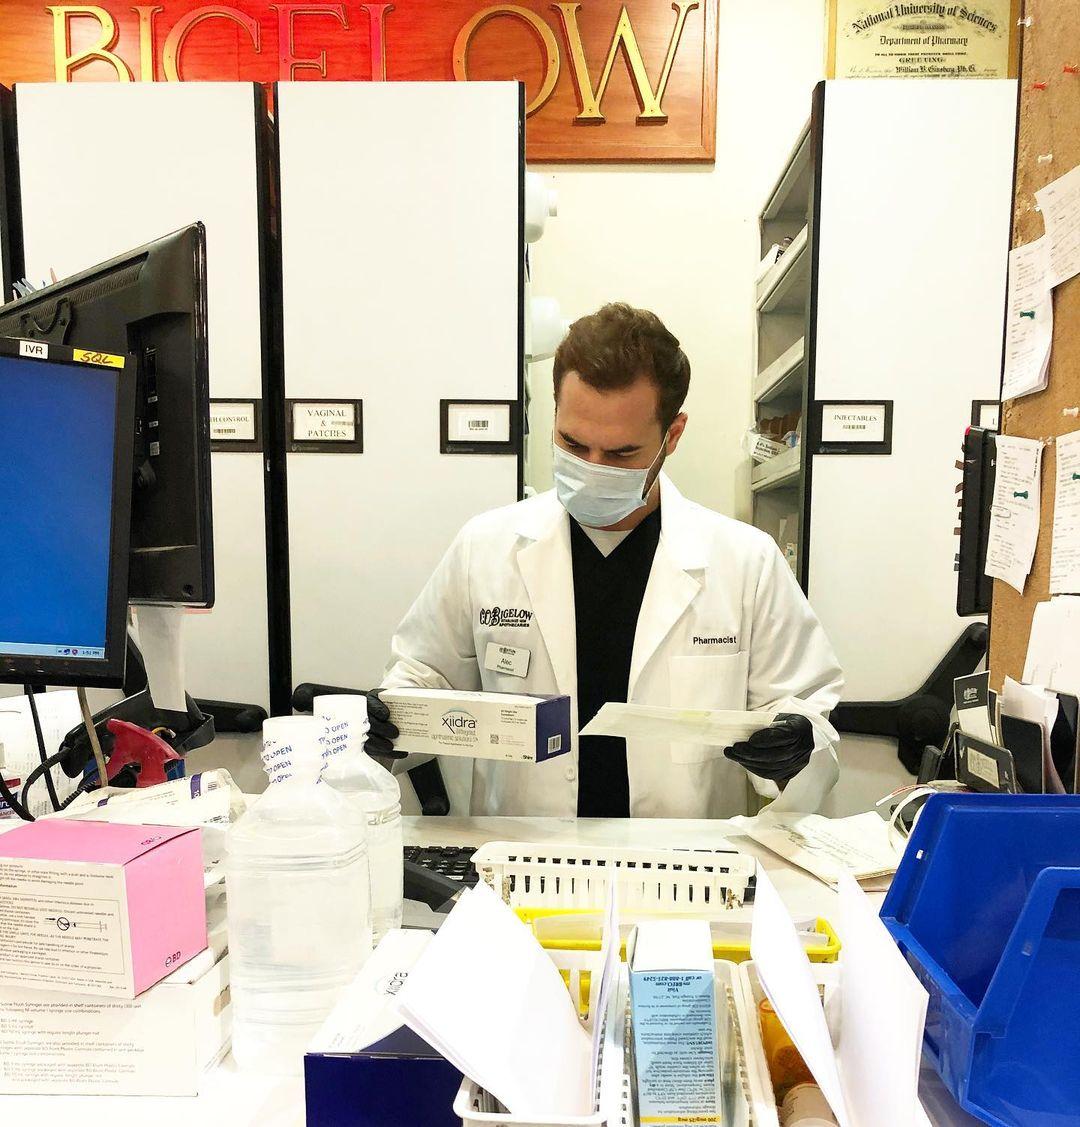 COVID Vaccines at C.O. Bigelow